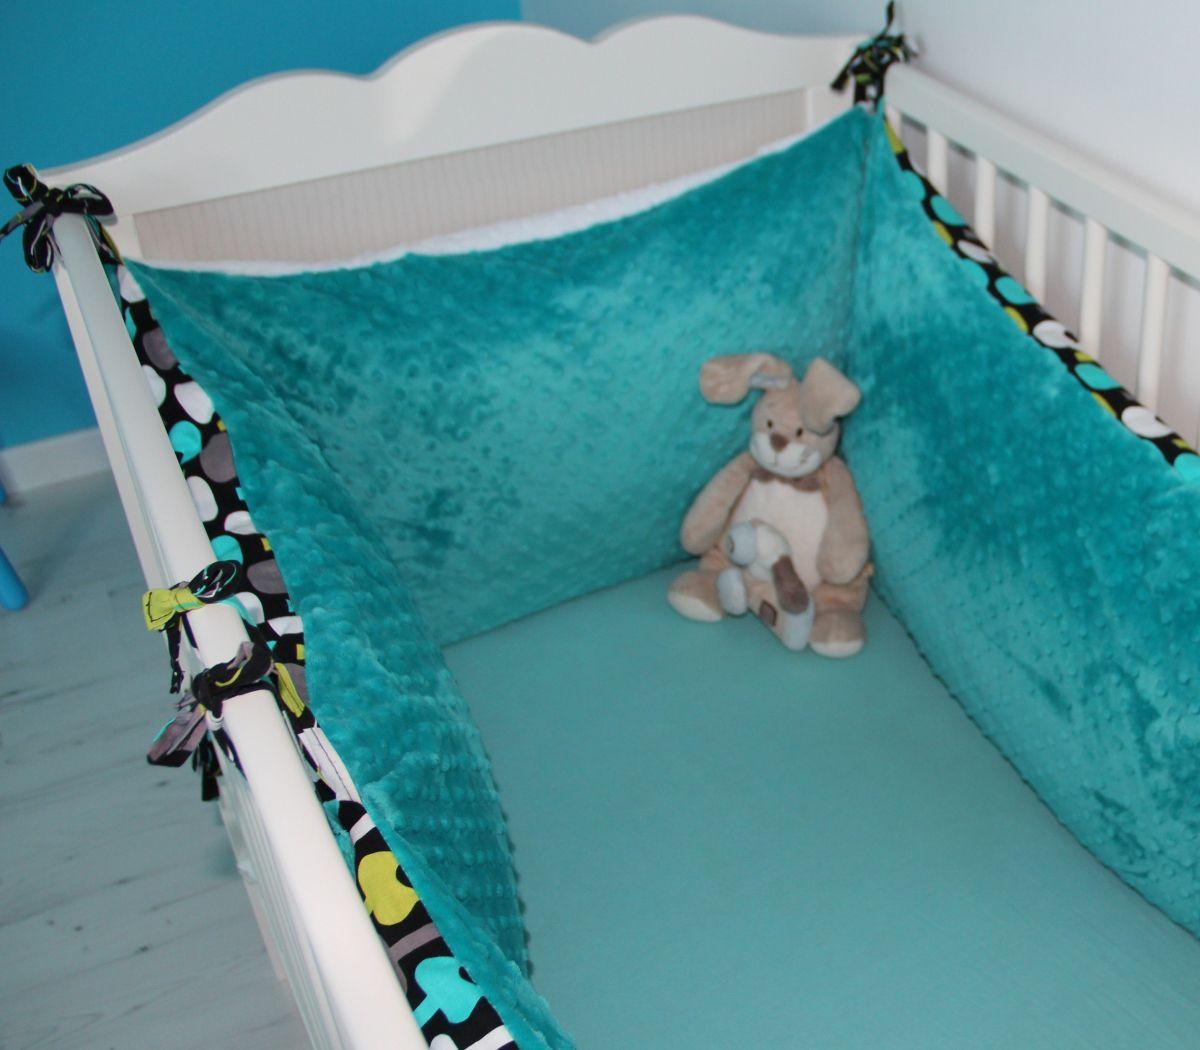 tour de lit adulte ikea etagere kallax ikea horizontale. Black Bedroom Furniture Sets. Home Design Ideas